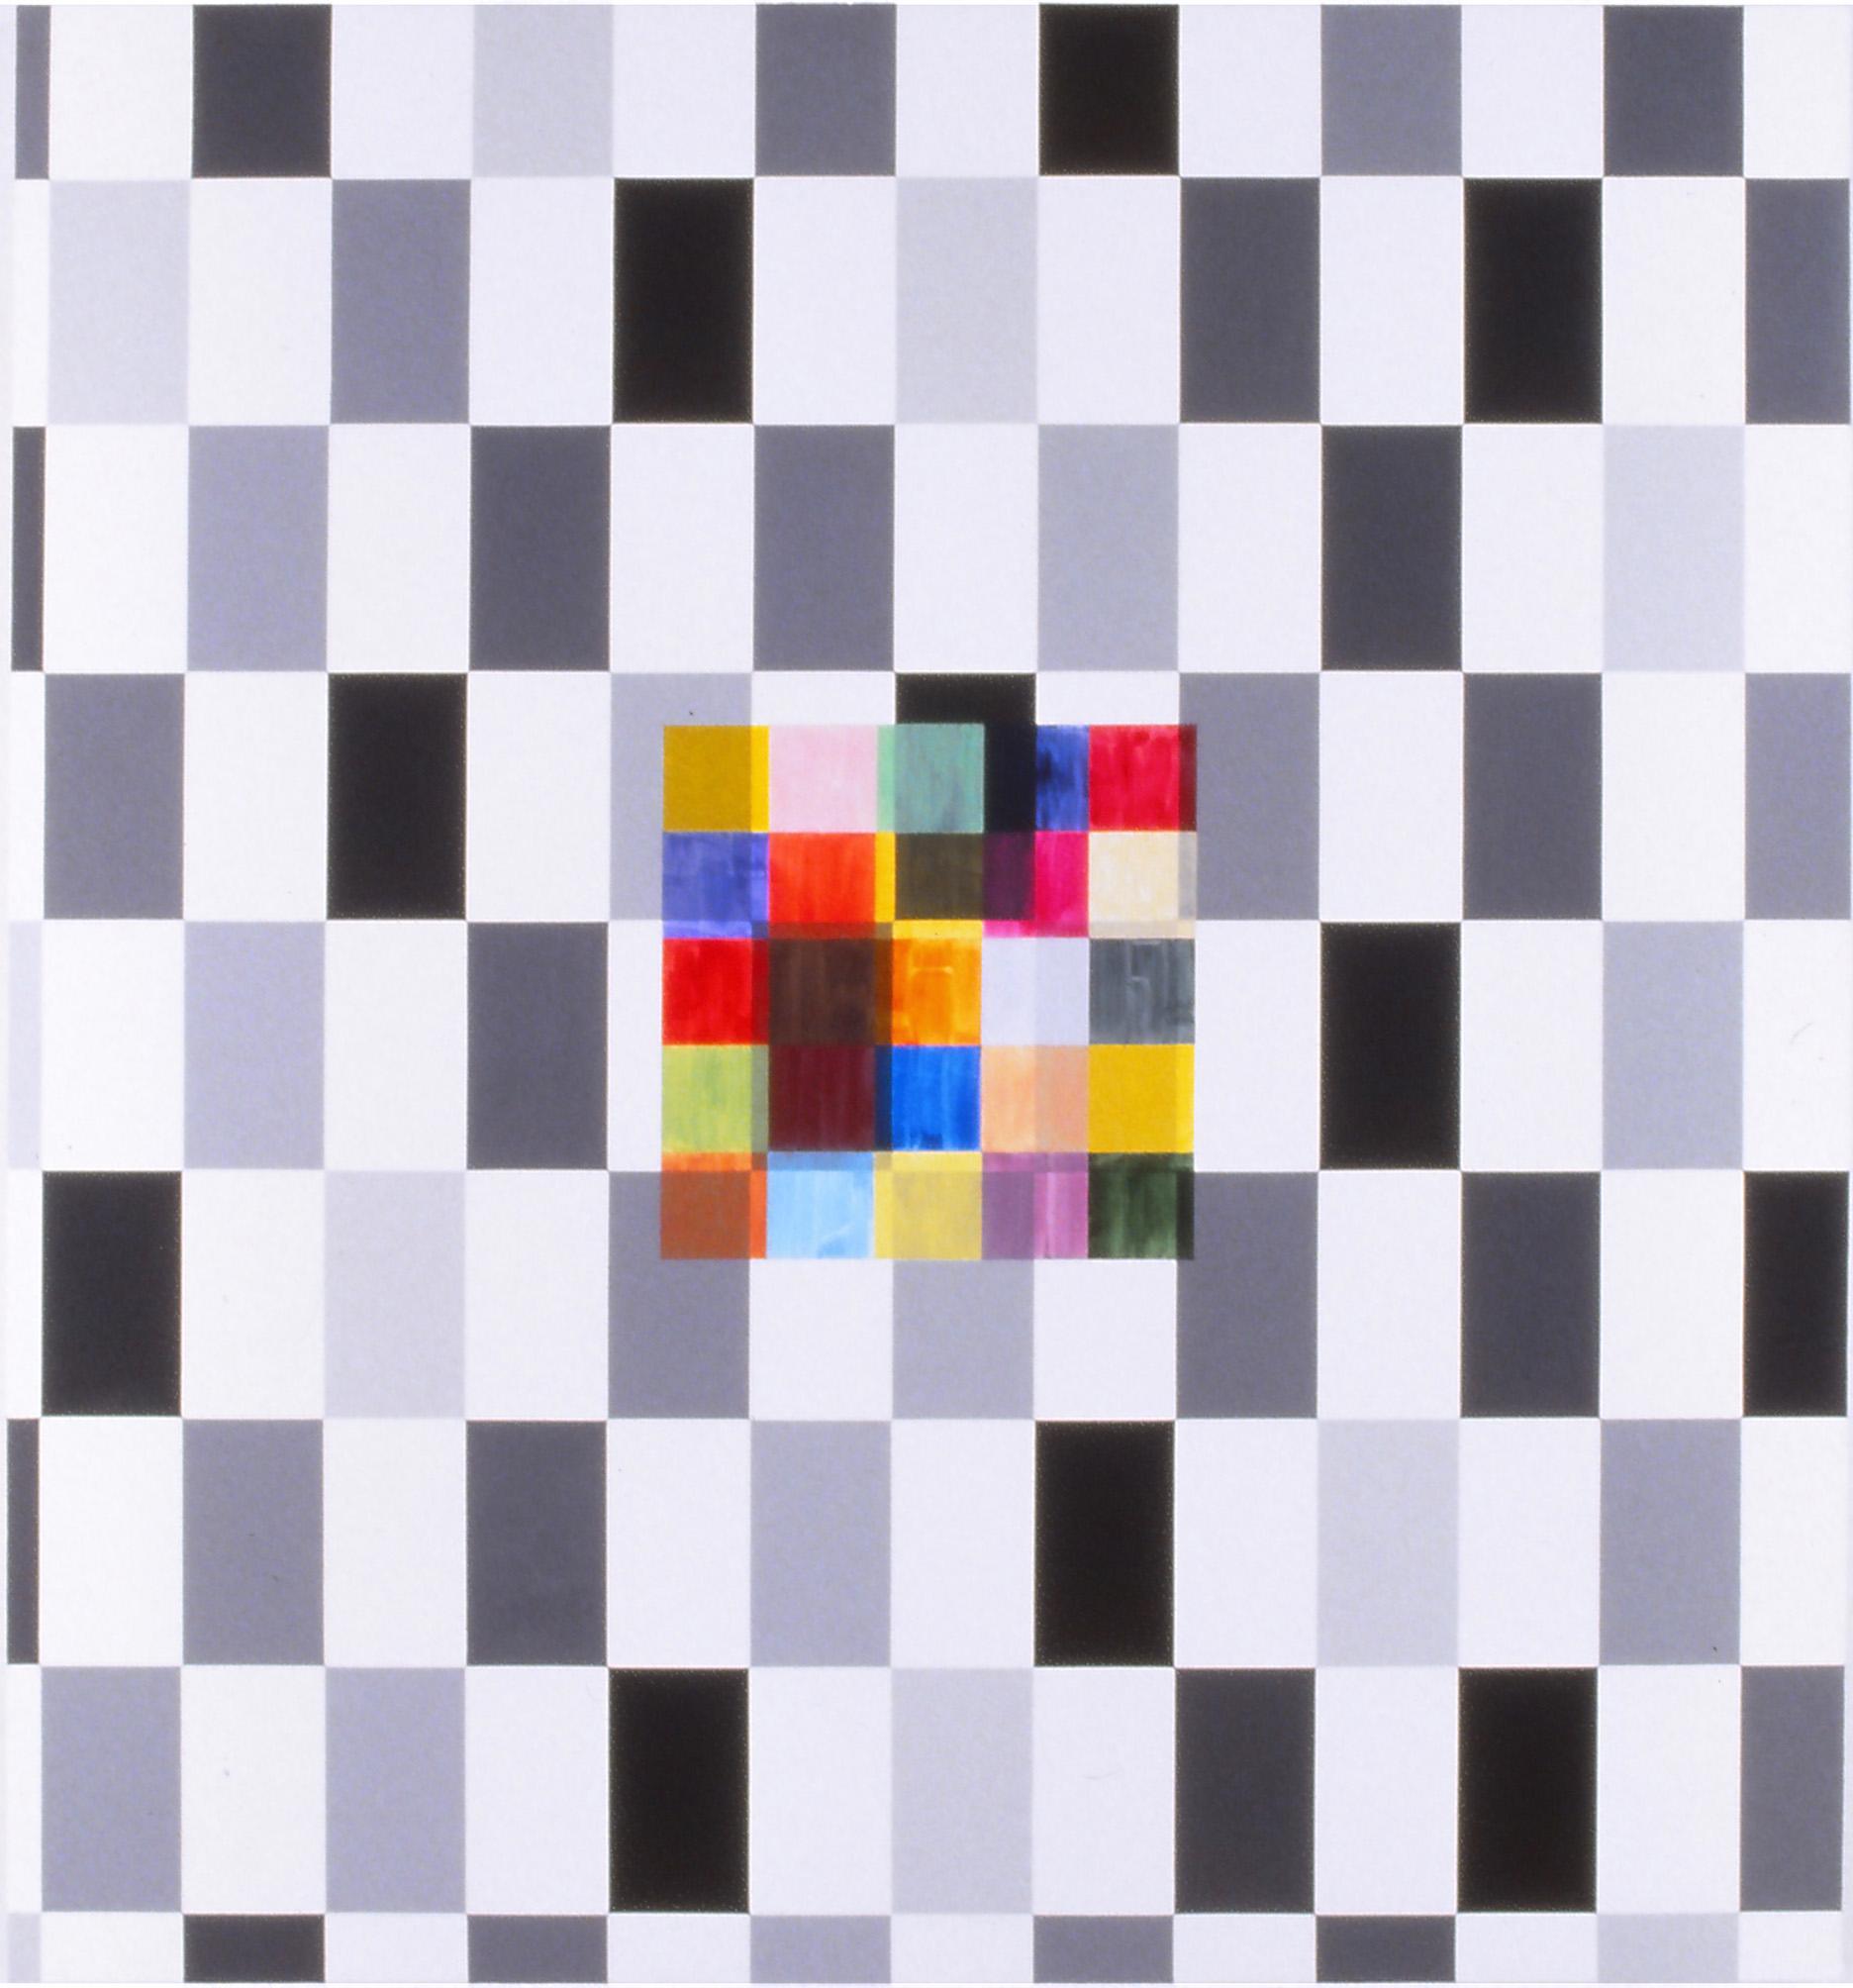 Untitled, 1993, 56x52